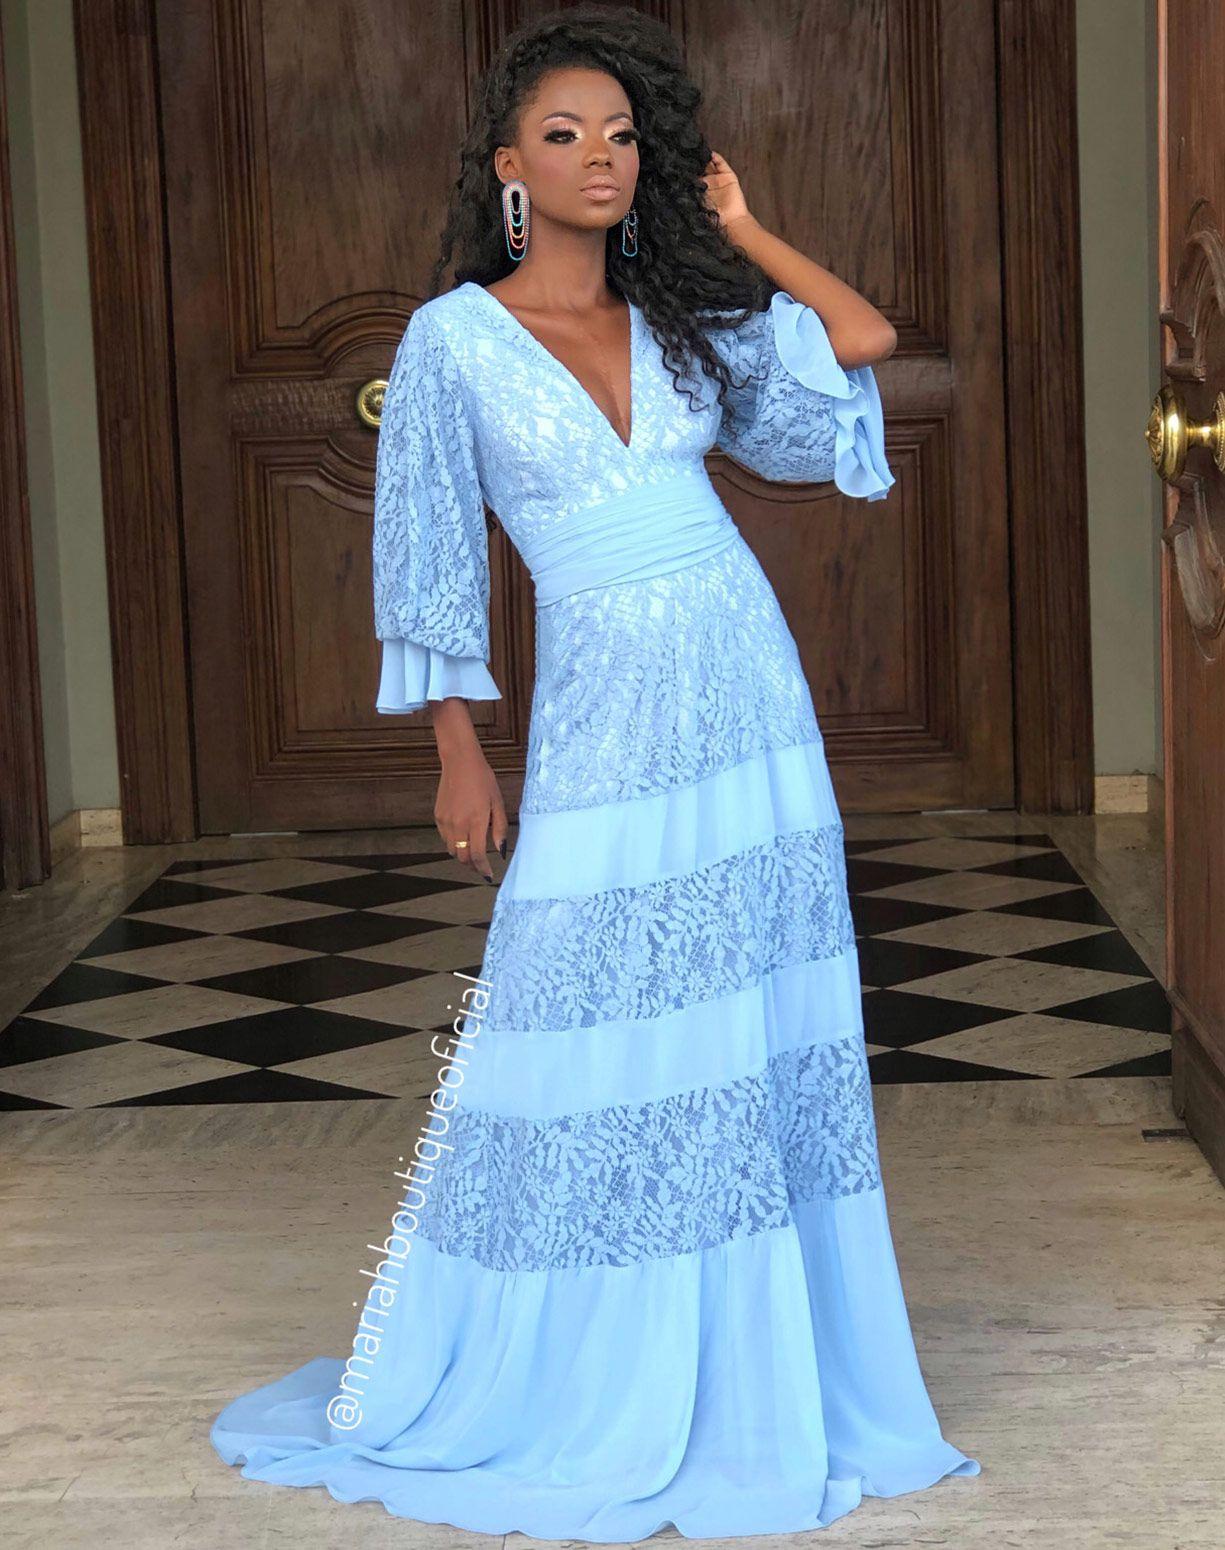 Vestido Azul serenity em Renda e Musseline